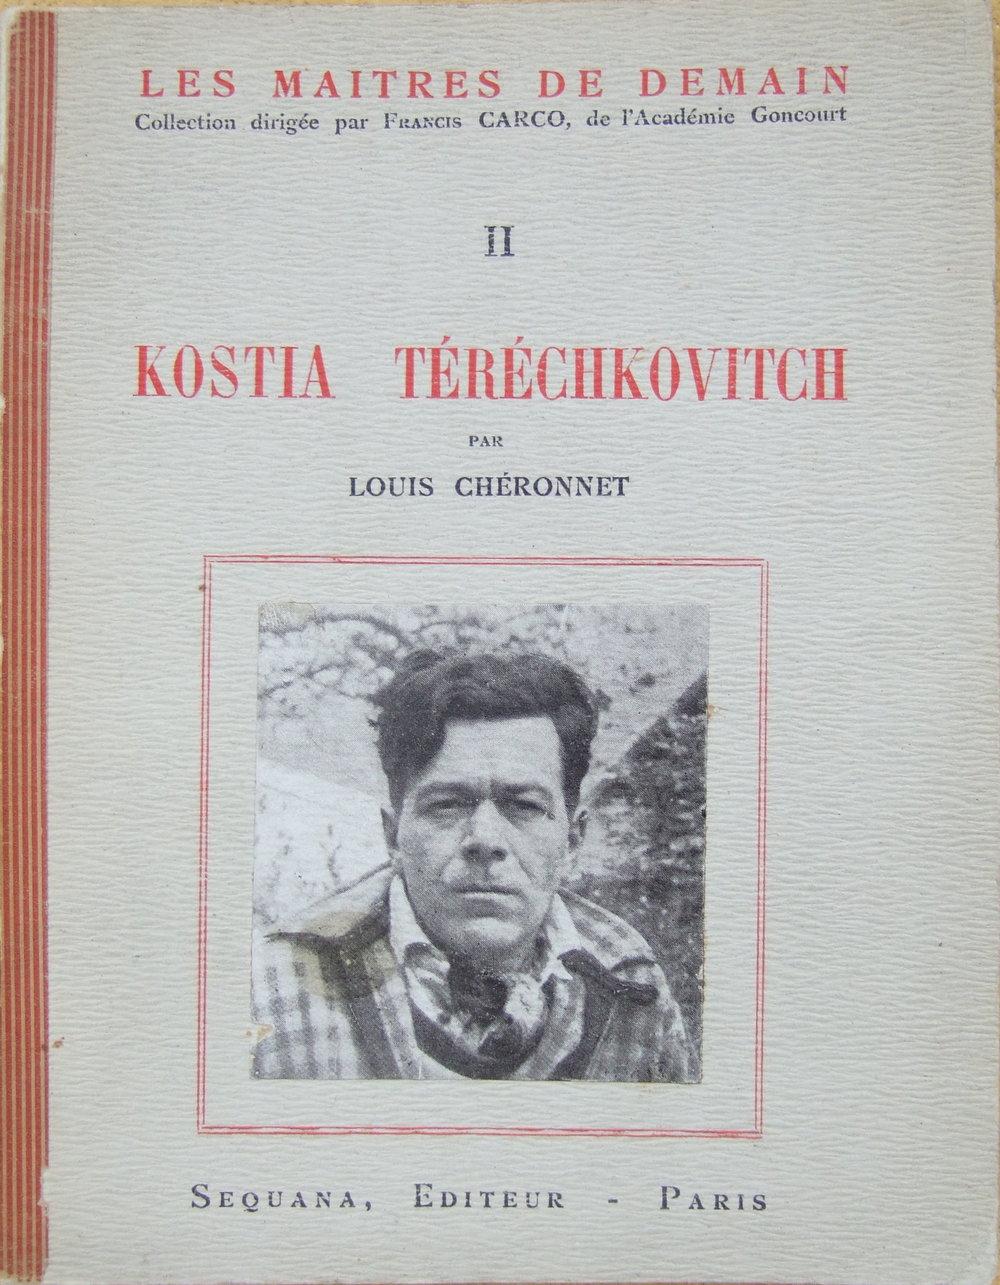 Kostia Terechkovitch